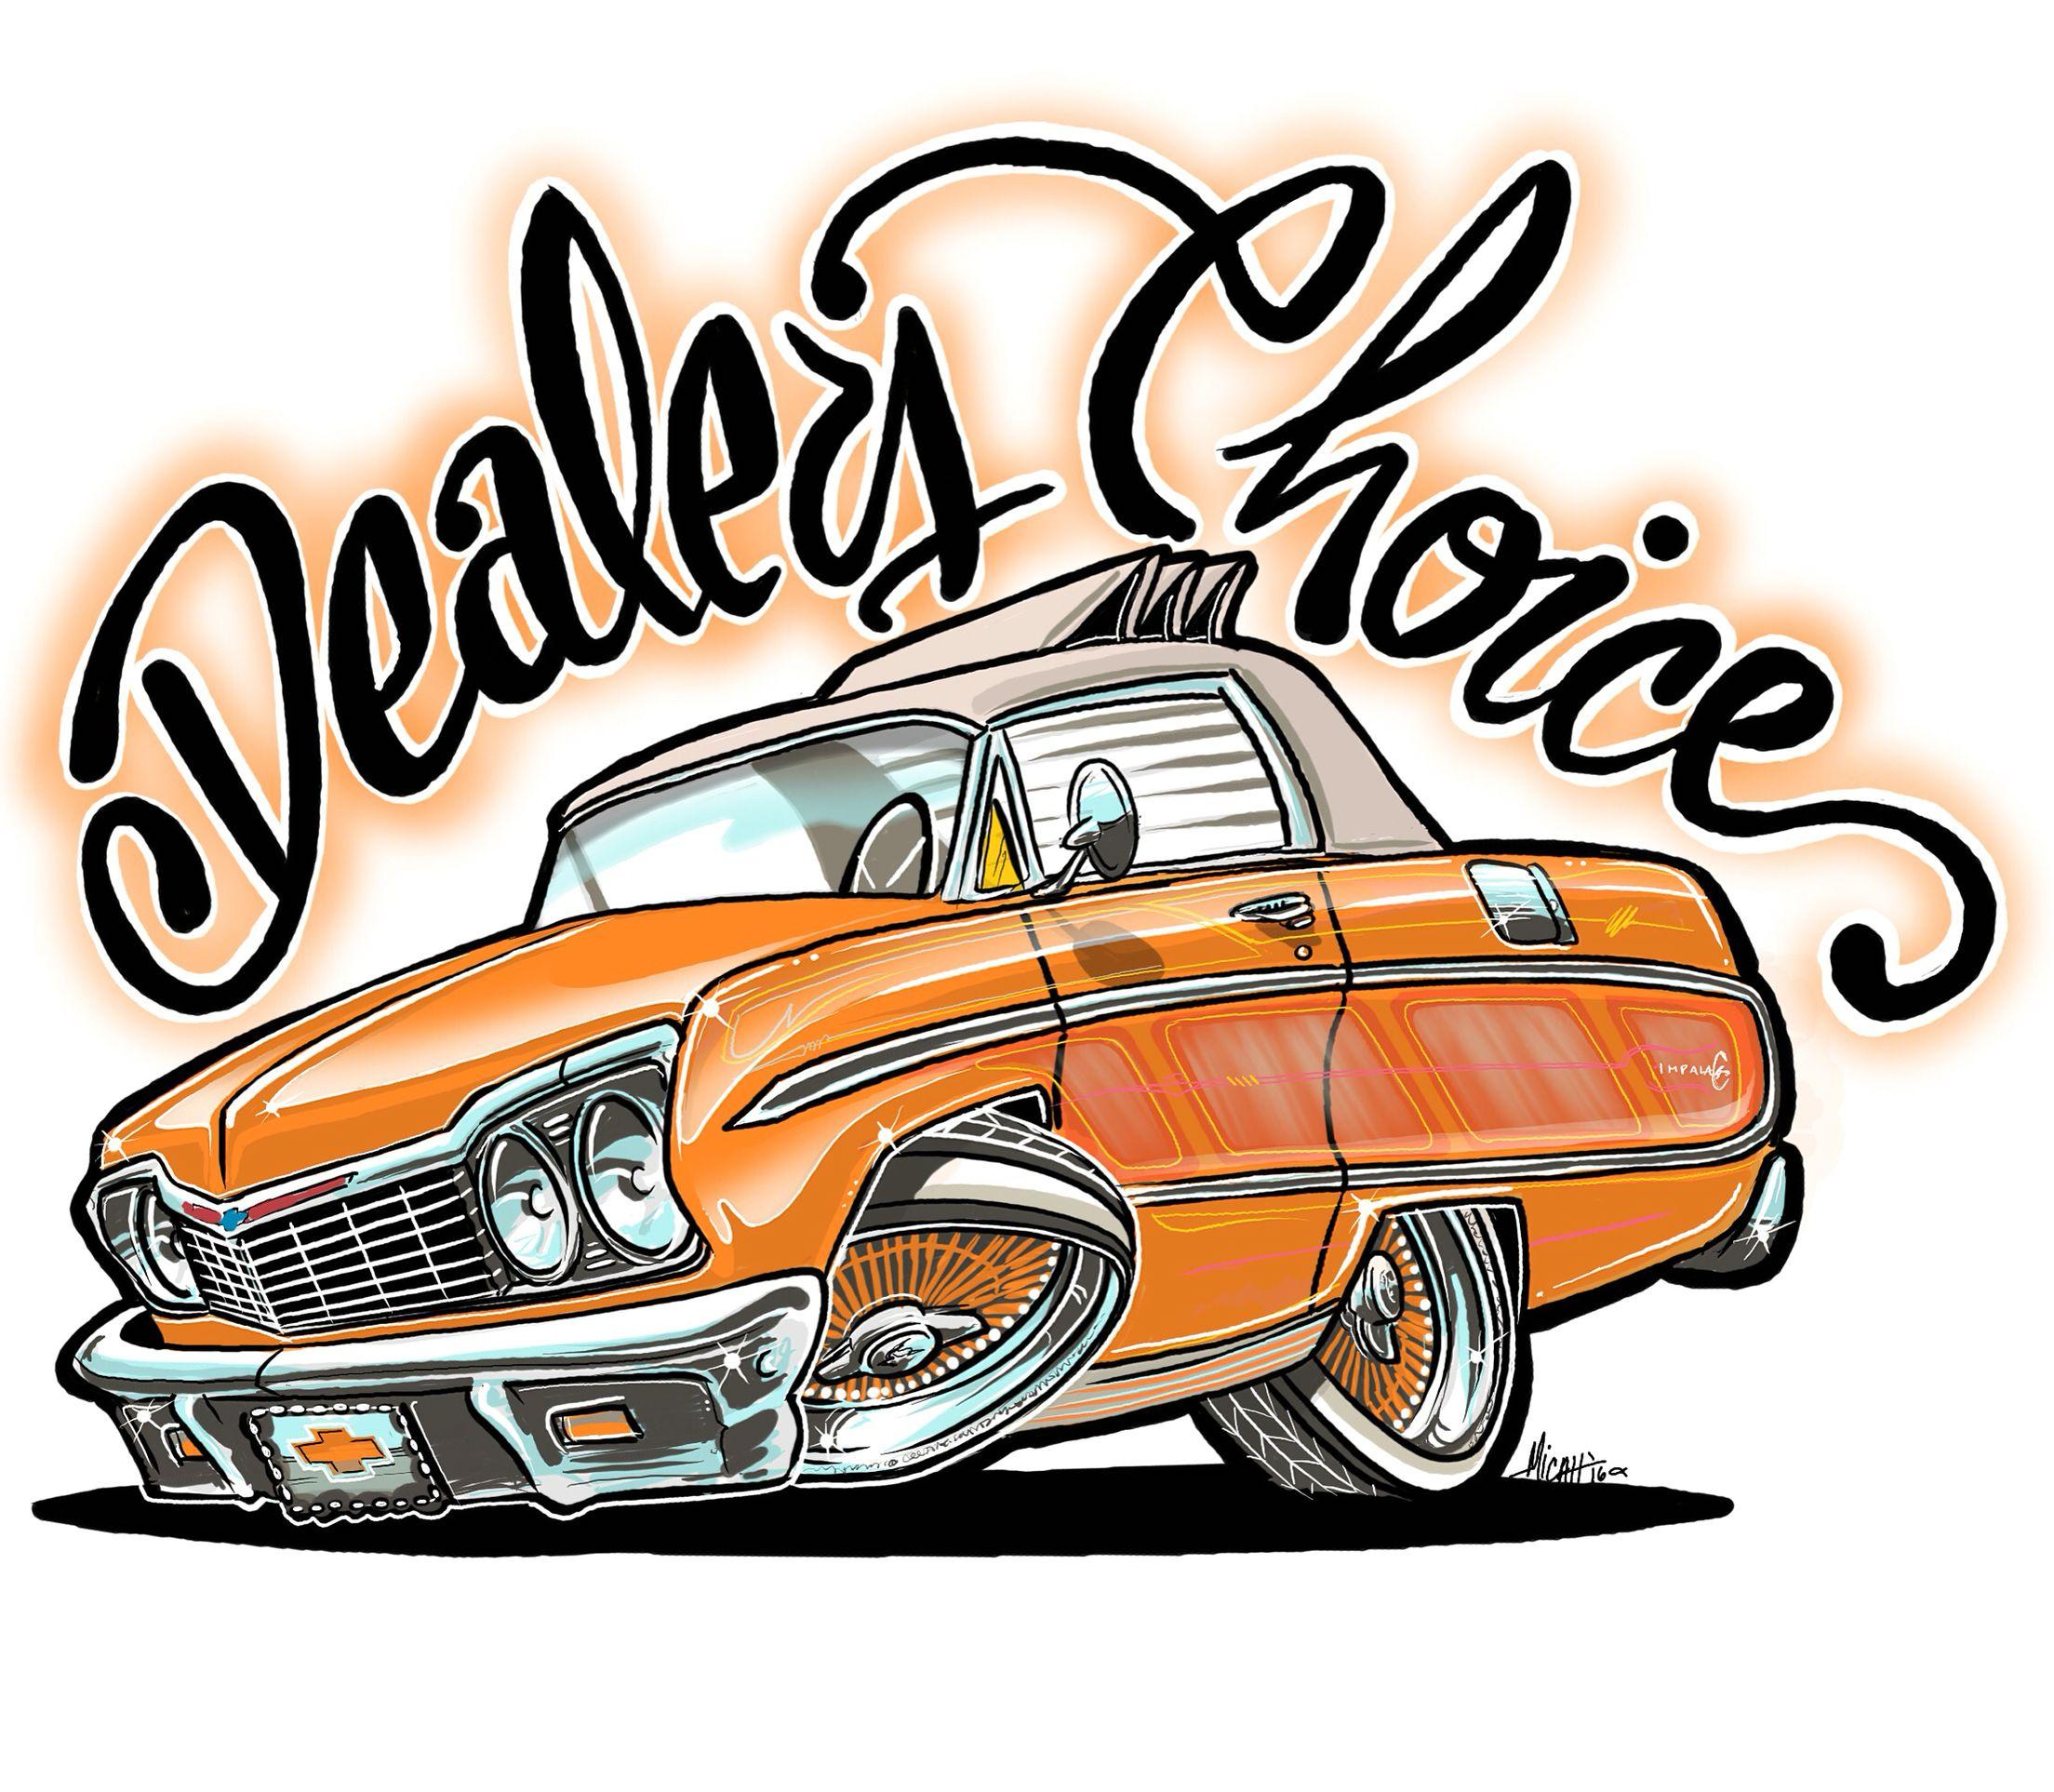 1964 Impala Show Winner Micahdoodles